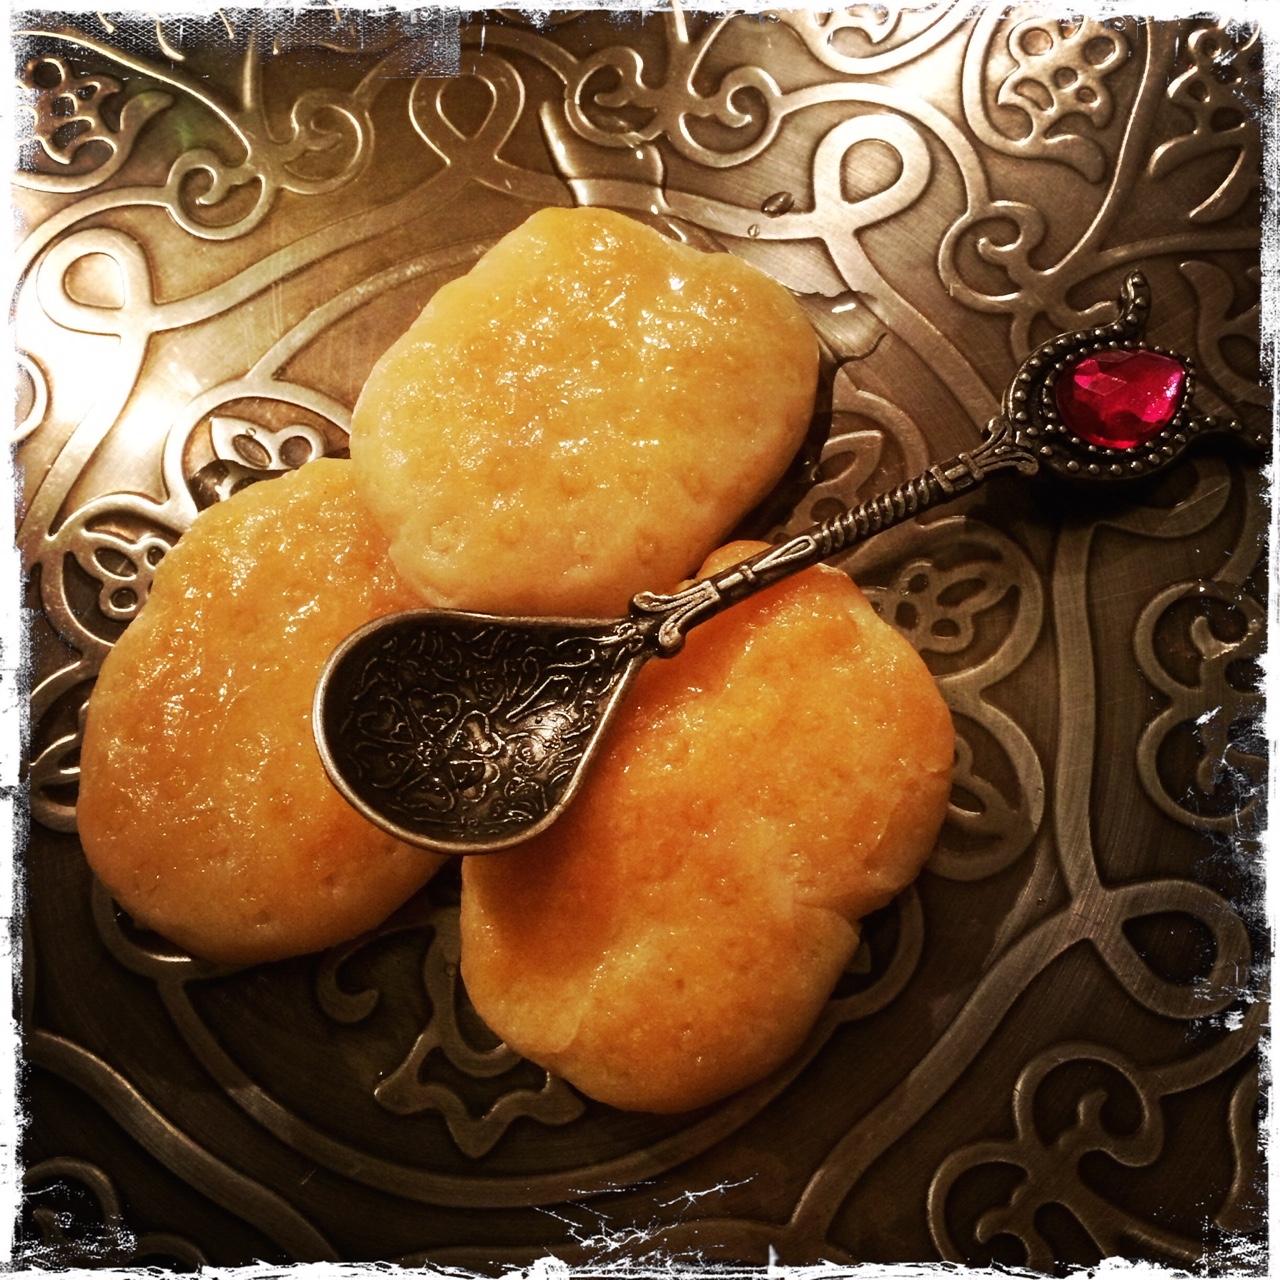 Hurmasice werden gerne zum Mokka oder Tee gegessen (Foto: balkanblogger)